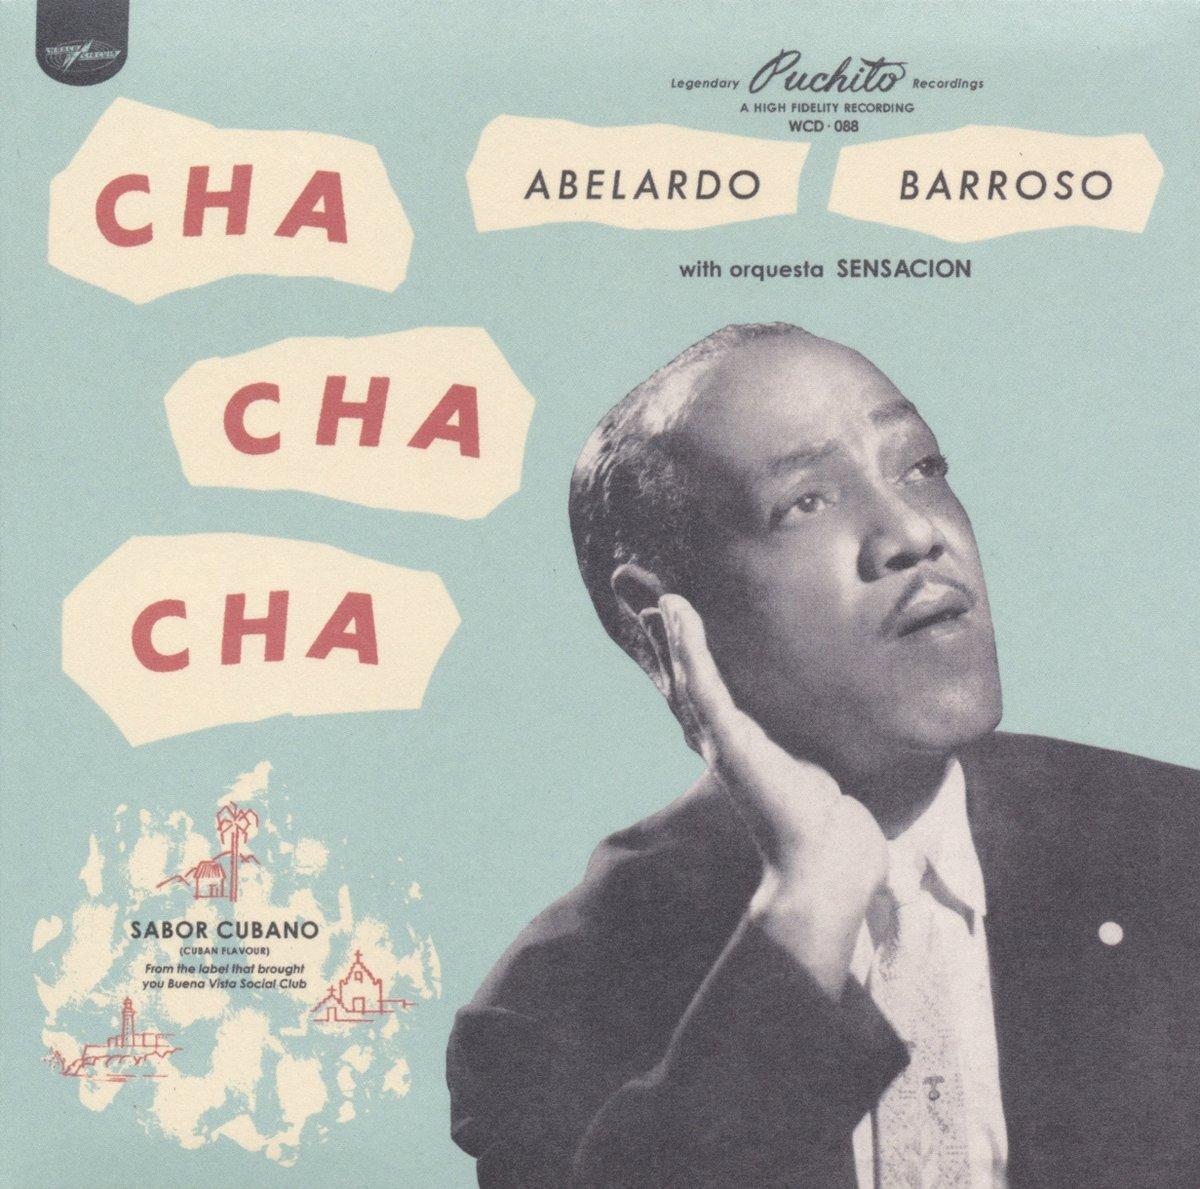 CD : BARROSO ABELARDO WITH ORQUESTA - Cha Cha Cha (CD)